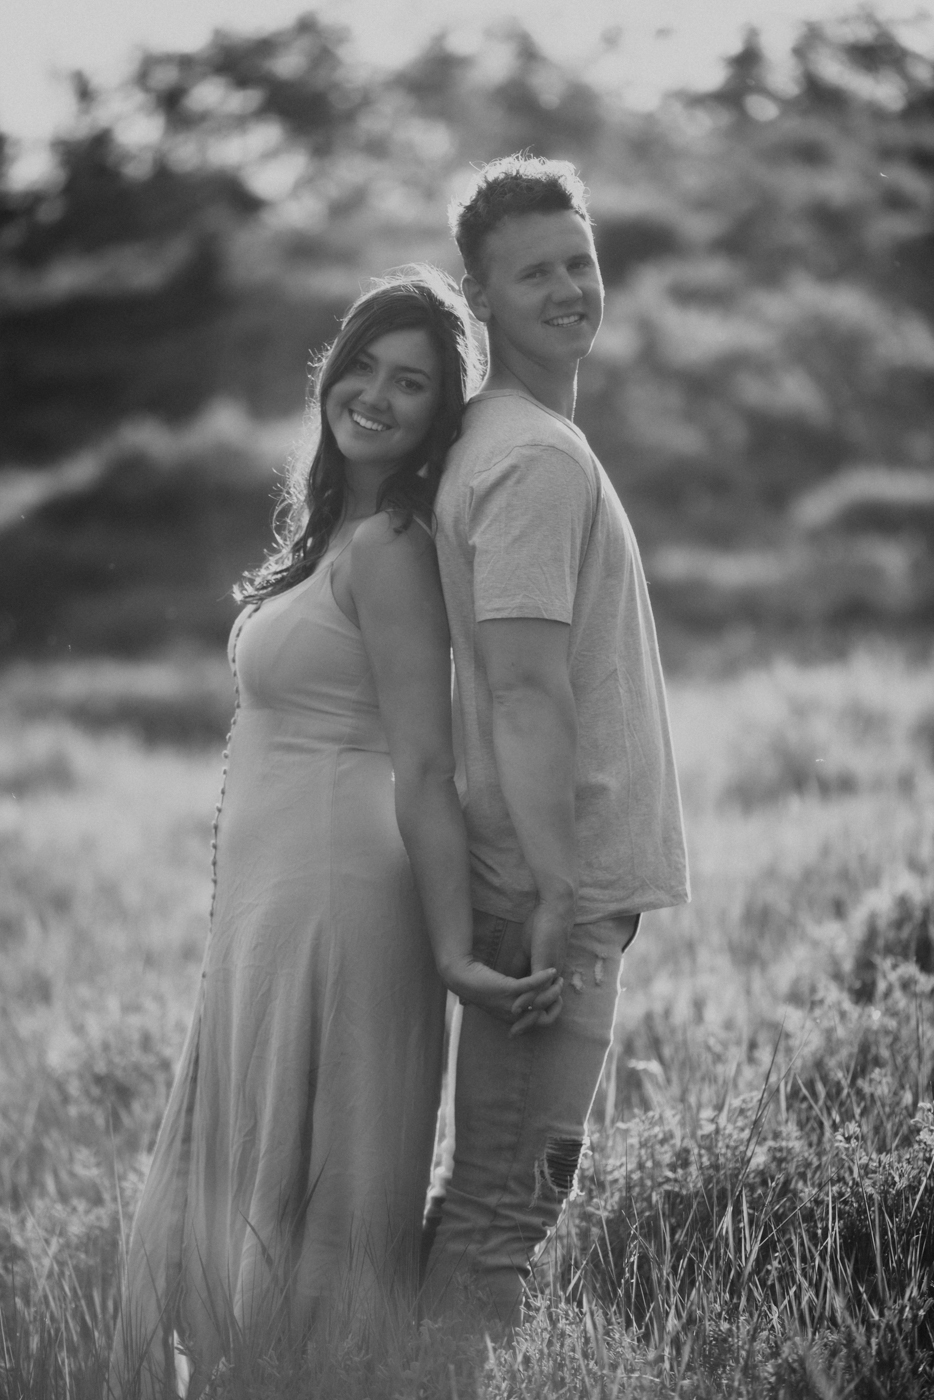 tyraephotography_photographer_wedding_elopement_engagement_photography-6209.jpg